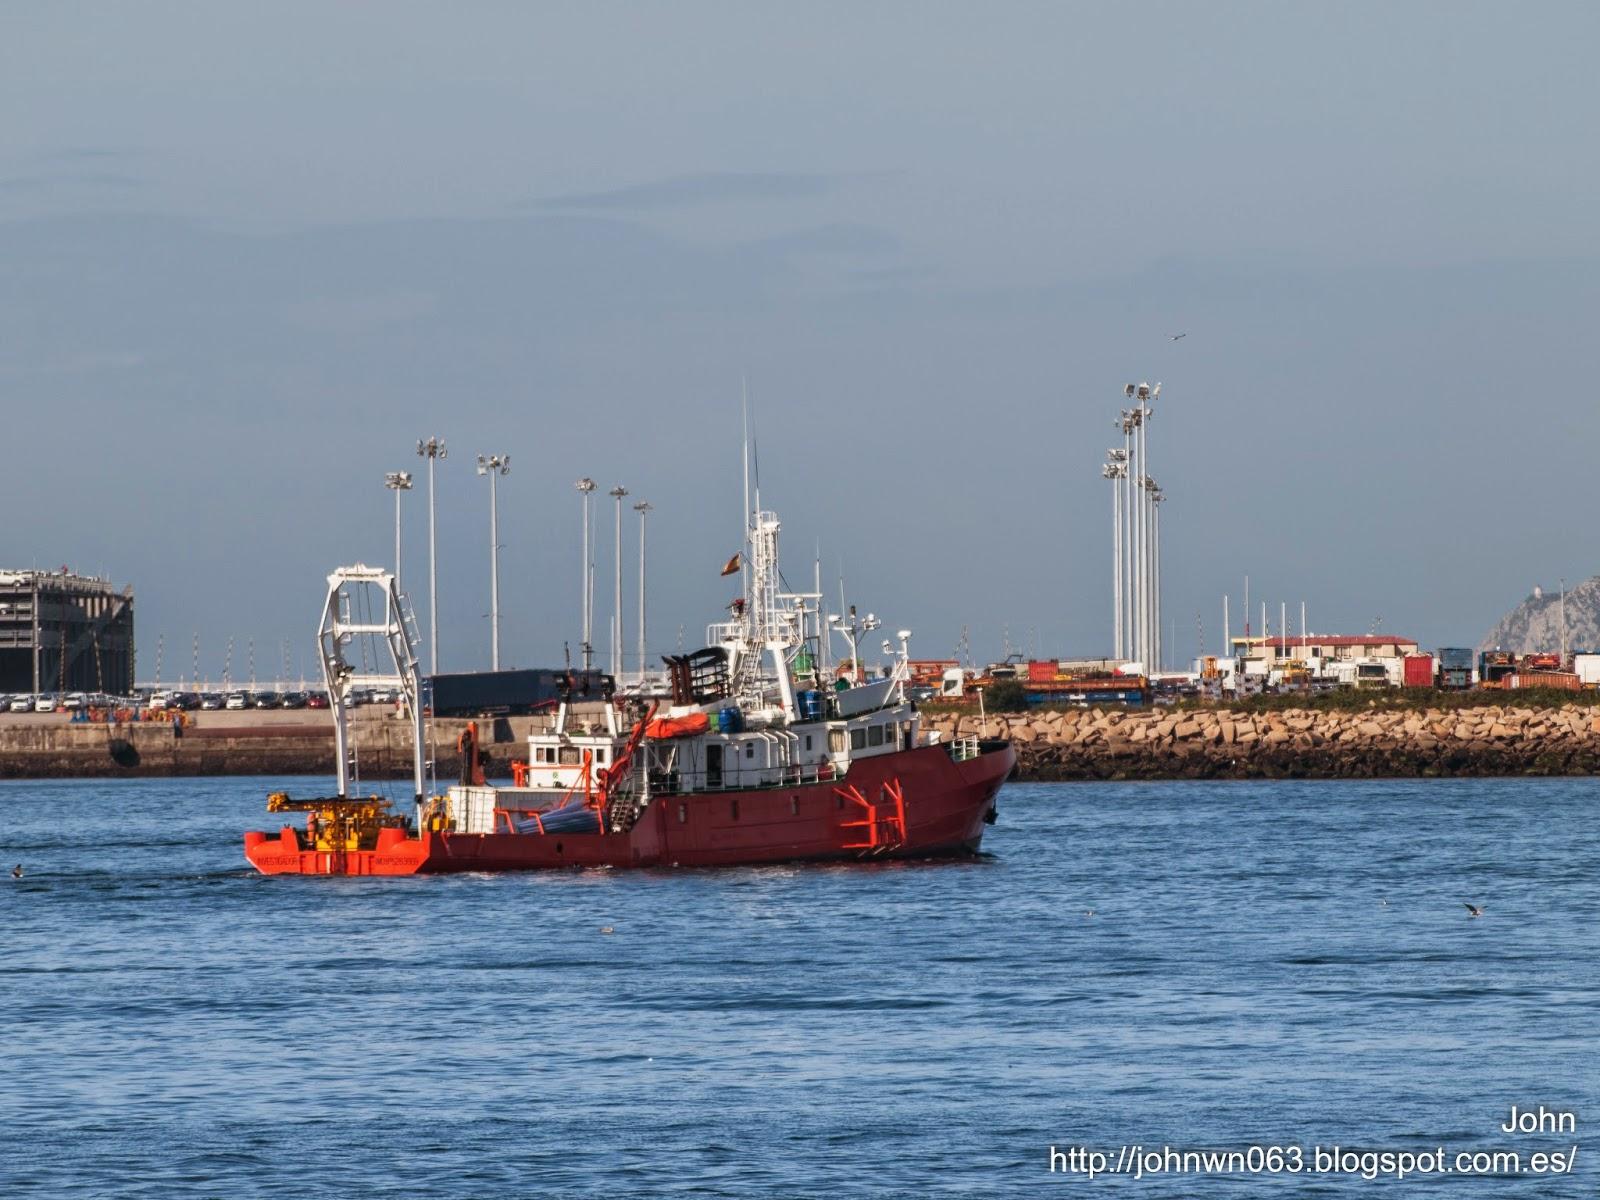 fotos de barcos, imagenes de barcos, investigador, oceanografico, vigo